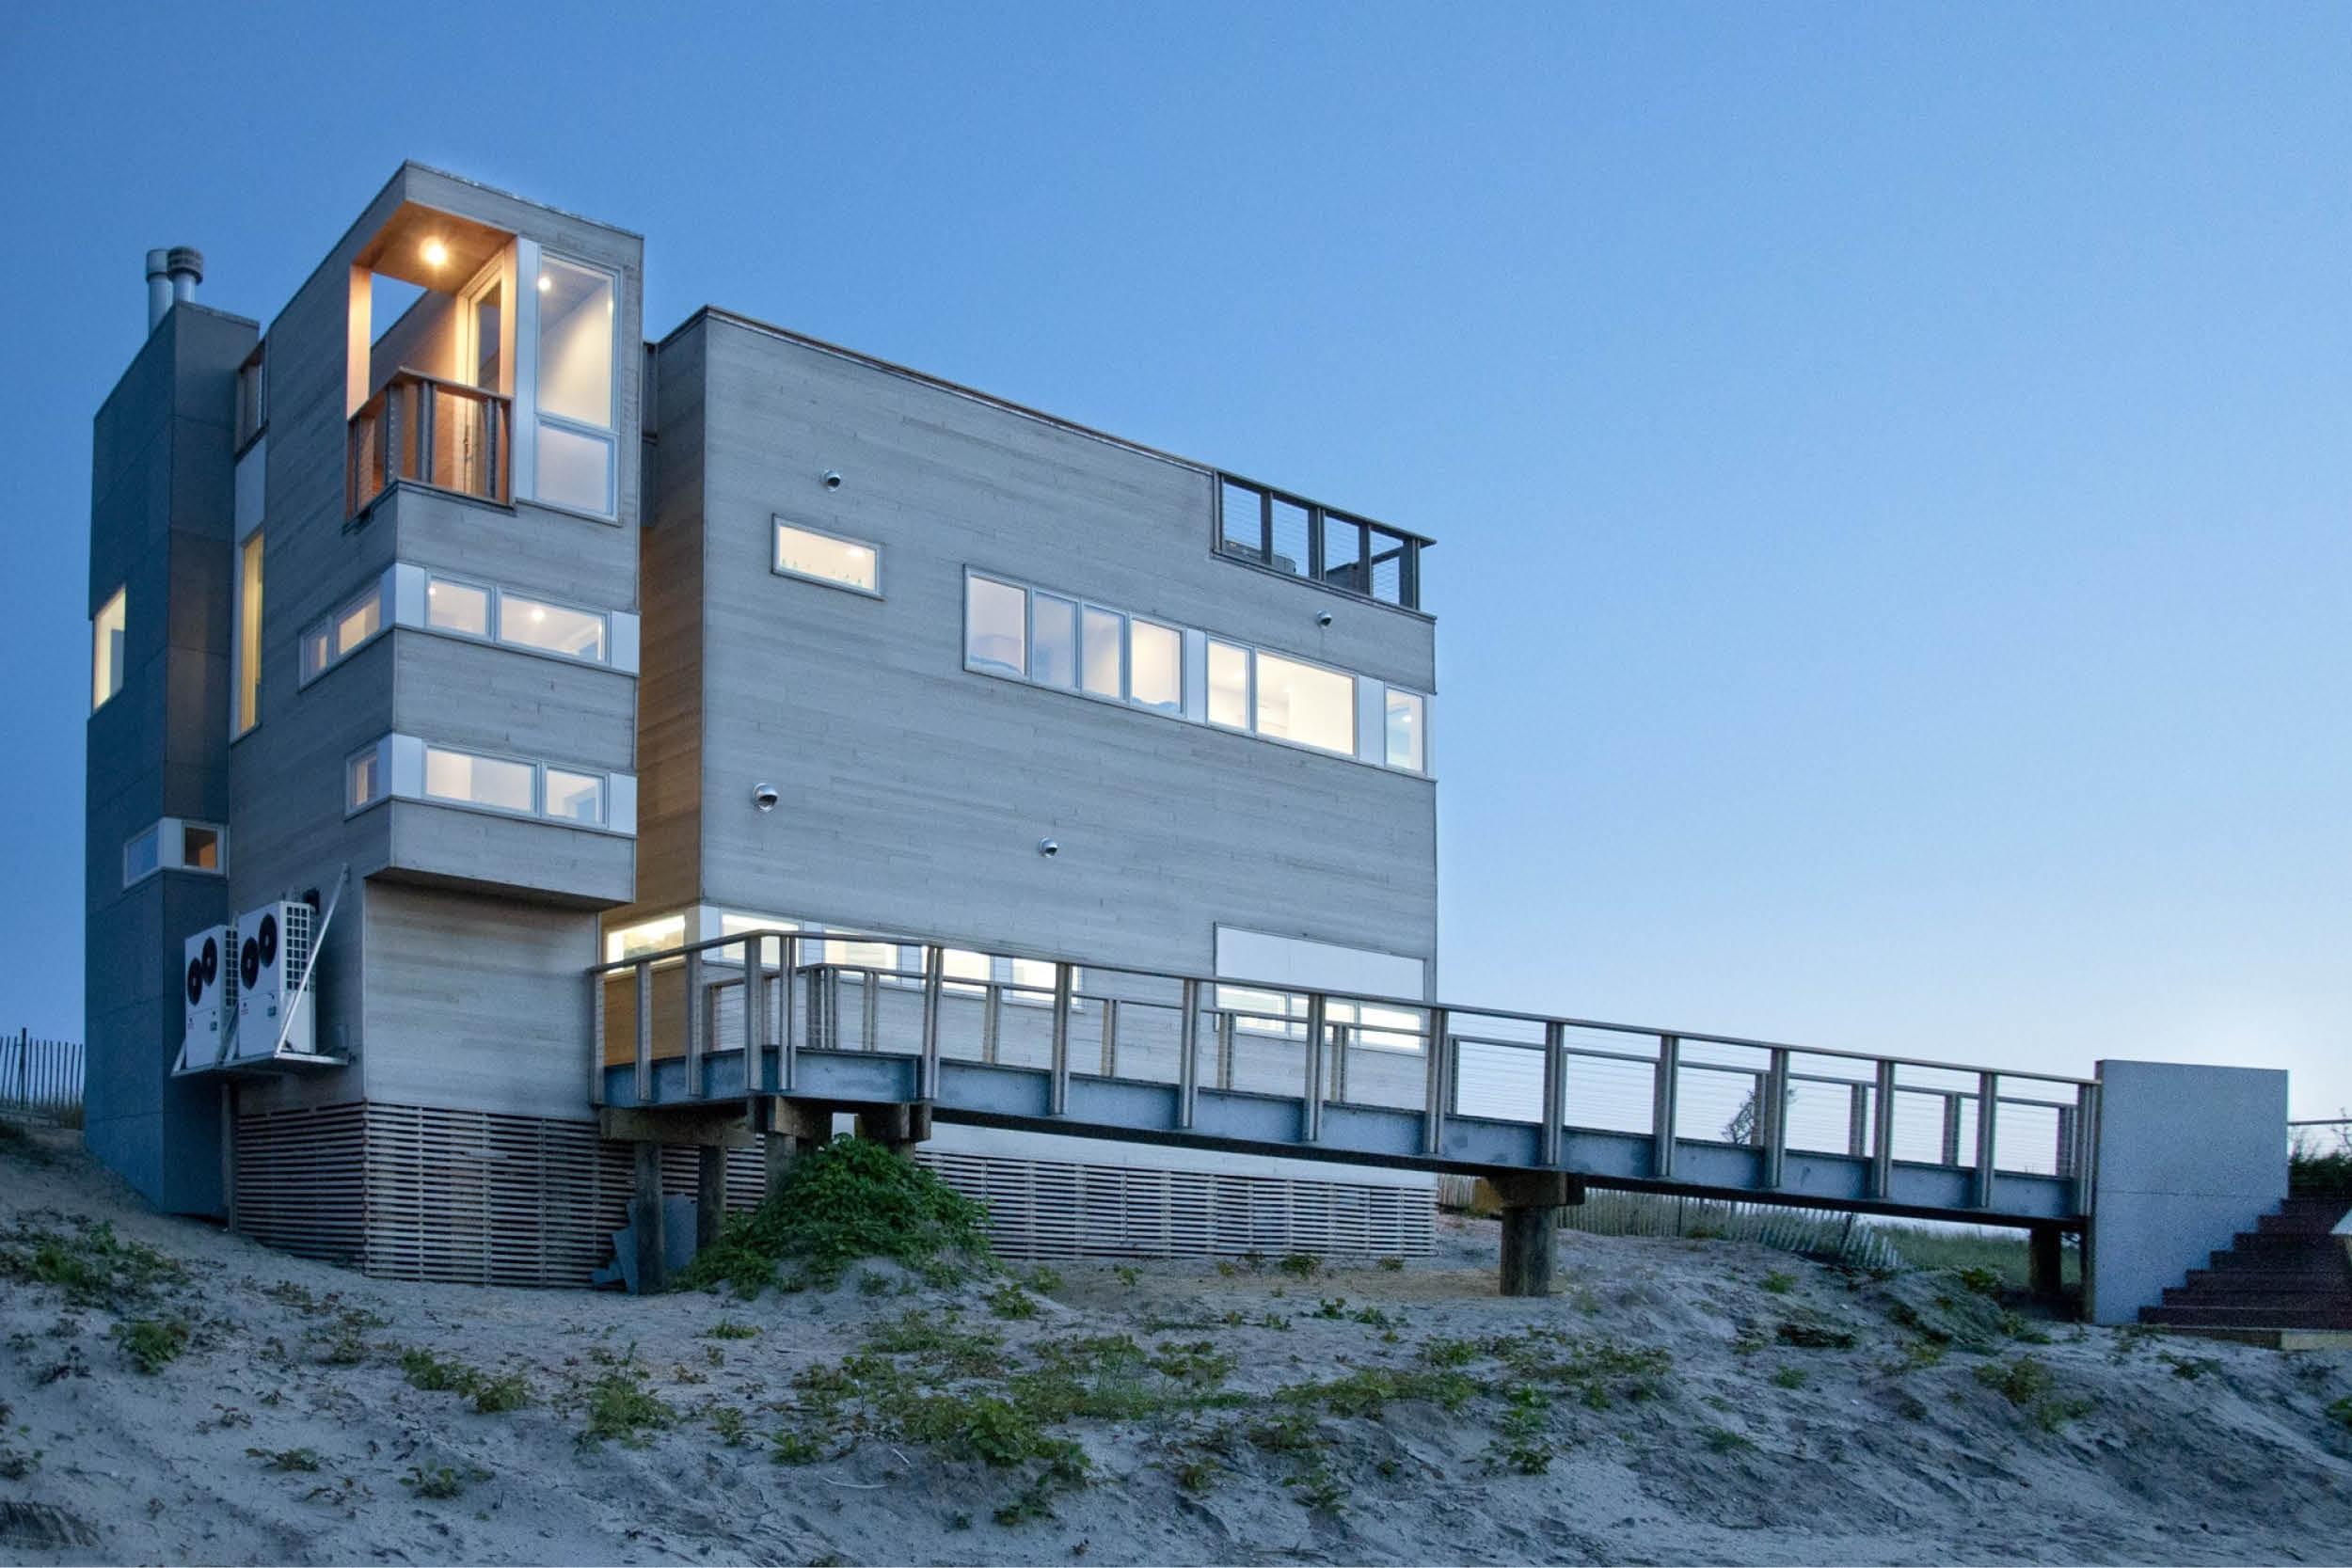 04-res4-resolution-4-architecture-modern-modular-home-prefab-dune-road-beach-house-exterior.jpg